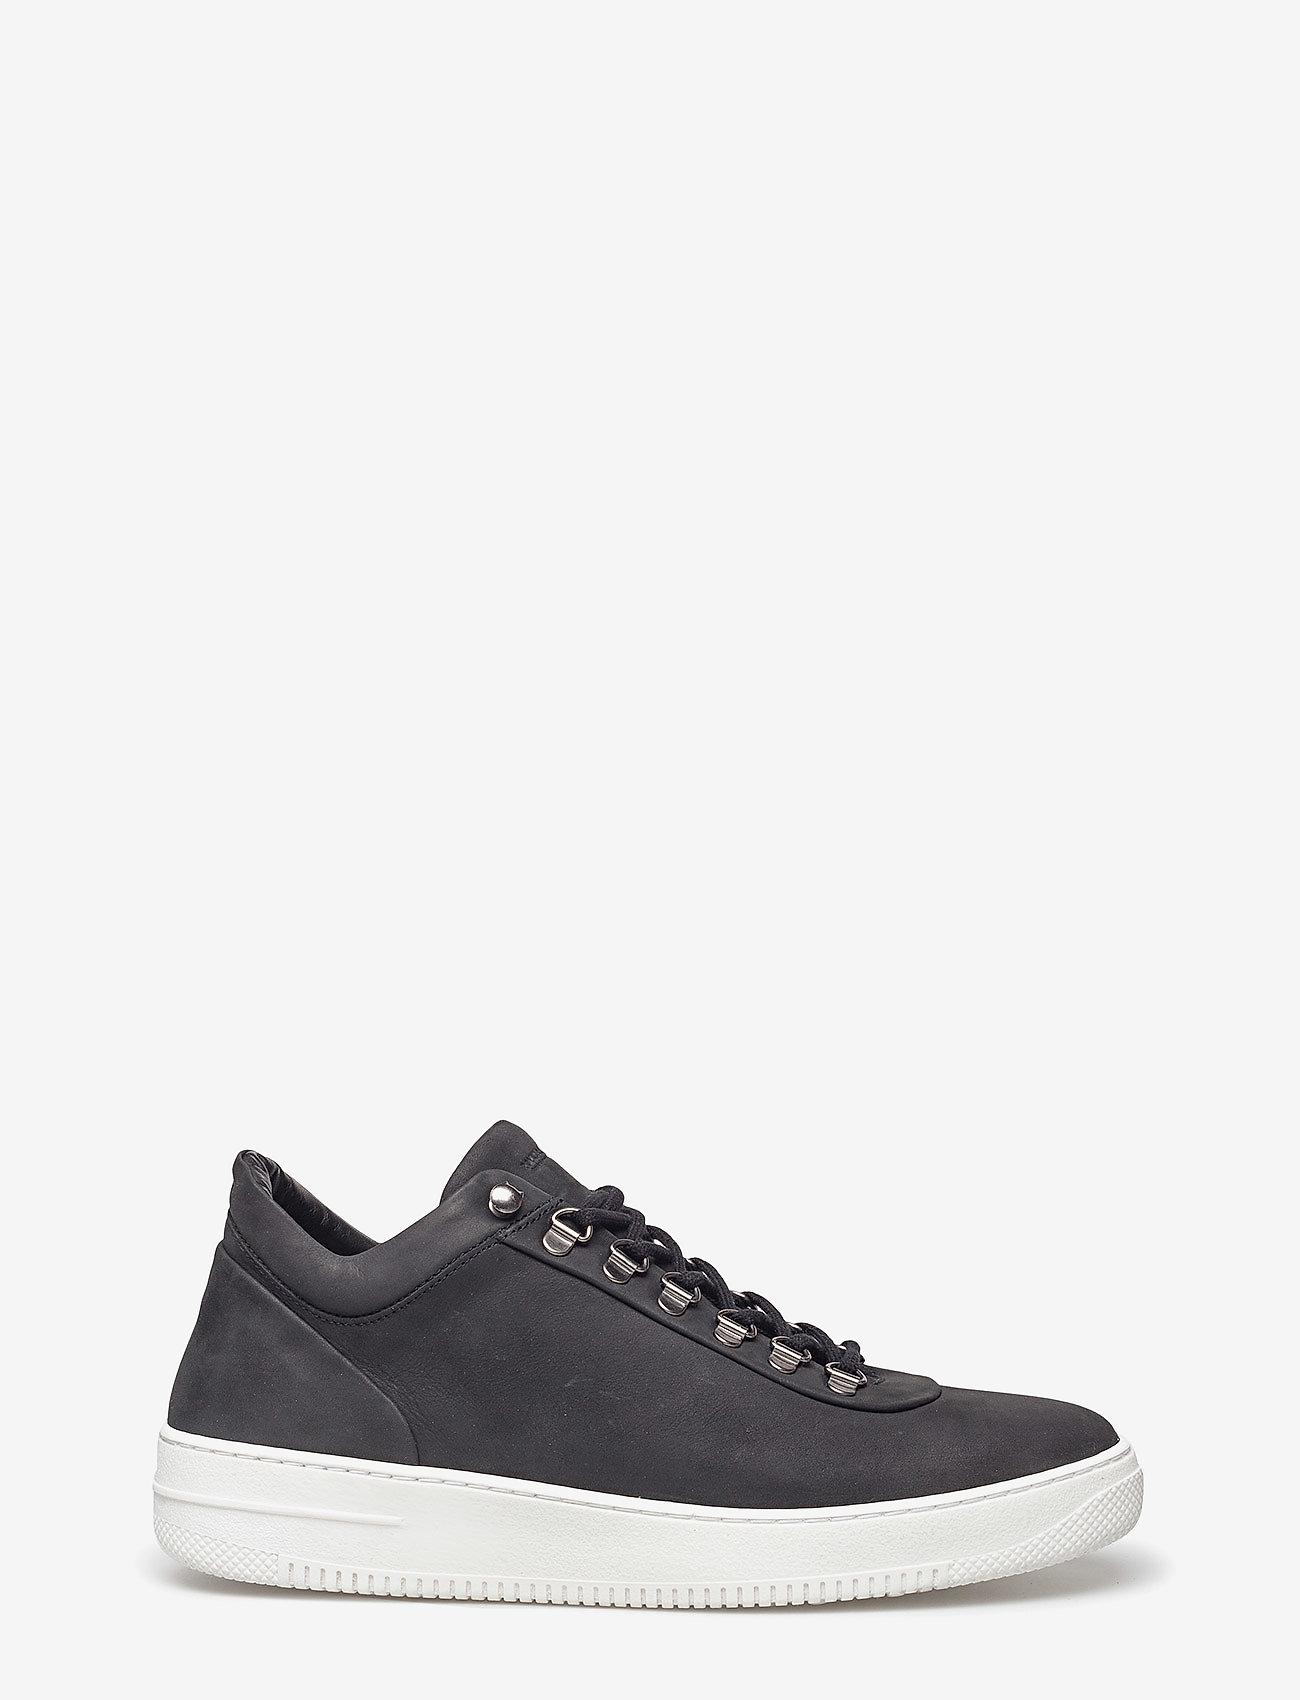 Seven20 Hiker Oxford Shoe Nubuck